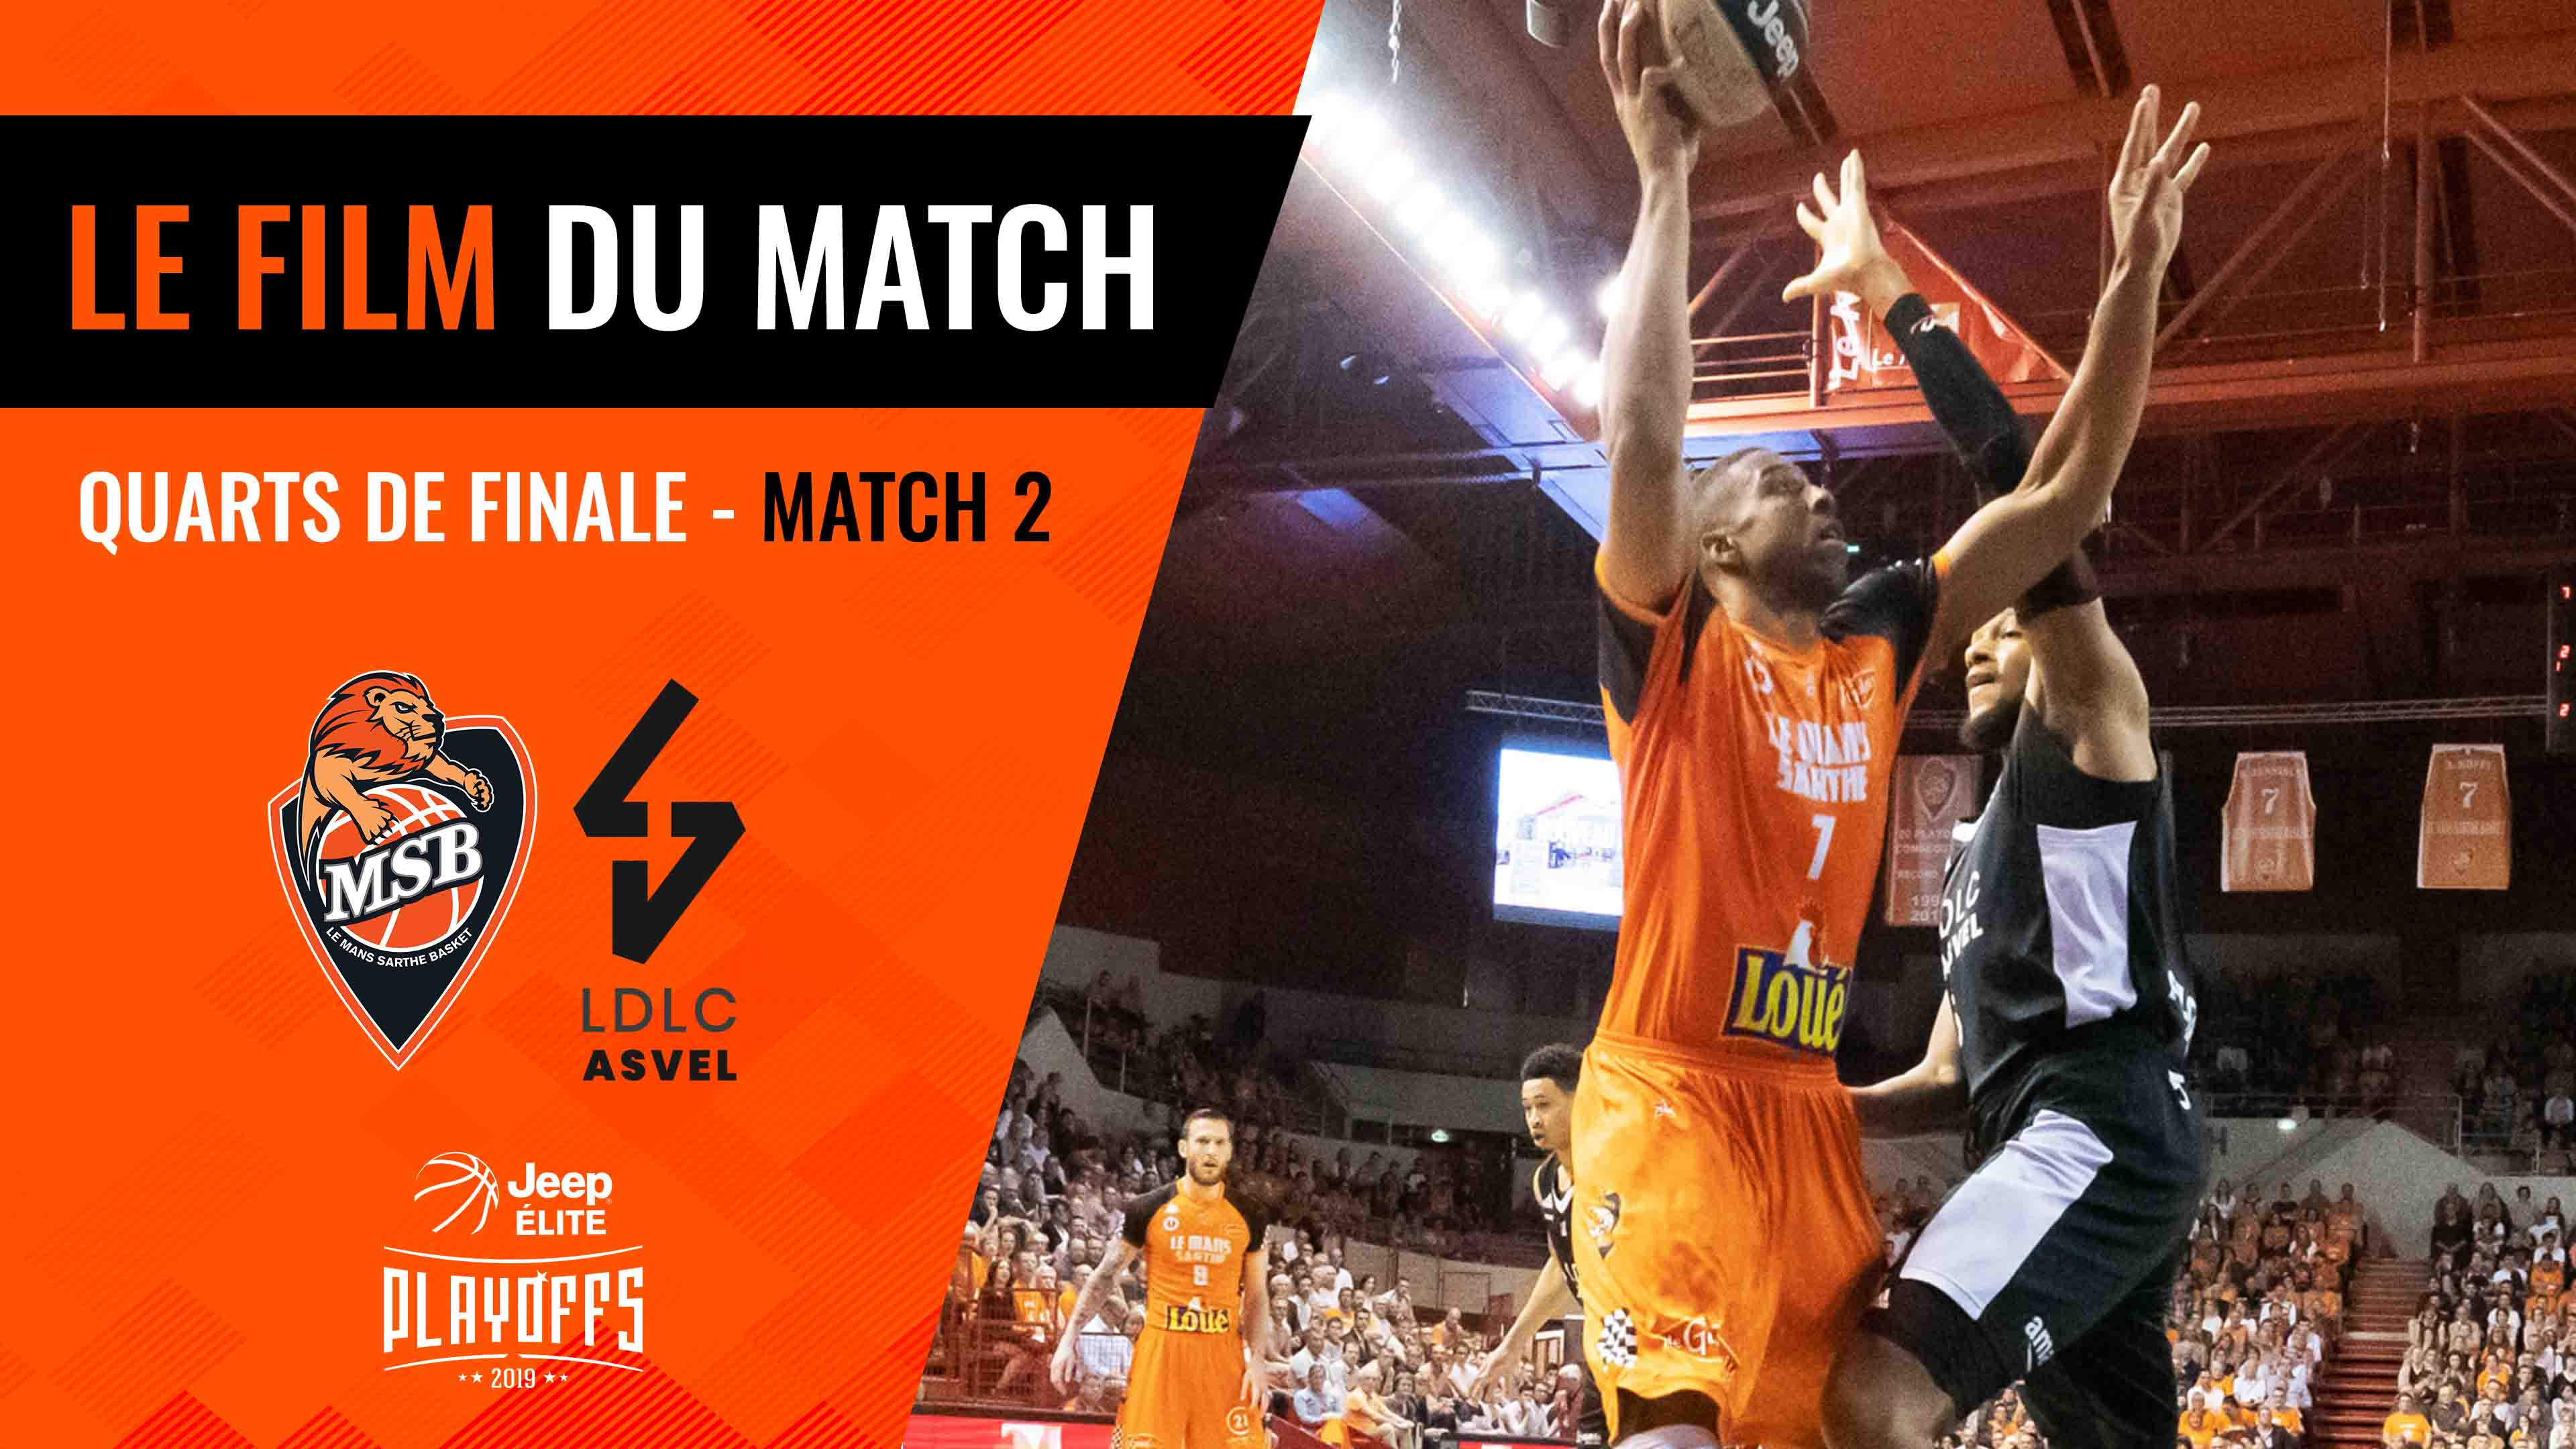 MSB - LDLC Asvel - Quarts de Finale | Match 2